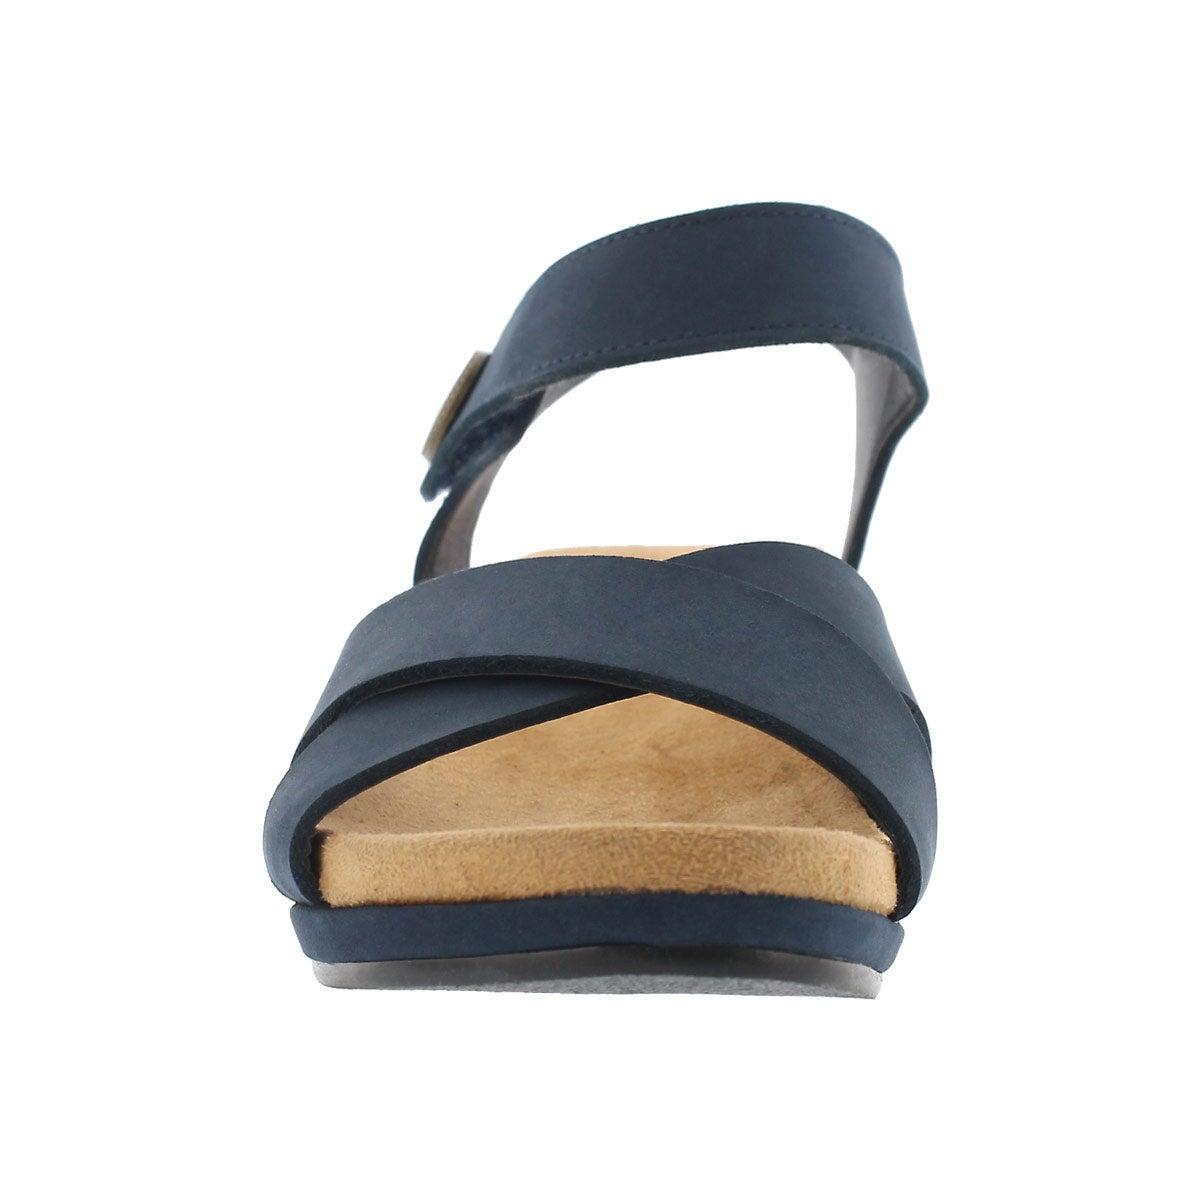 Lds Annalisa navy casual wedge sandal